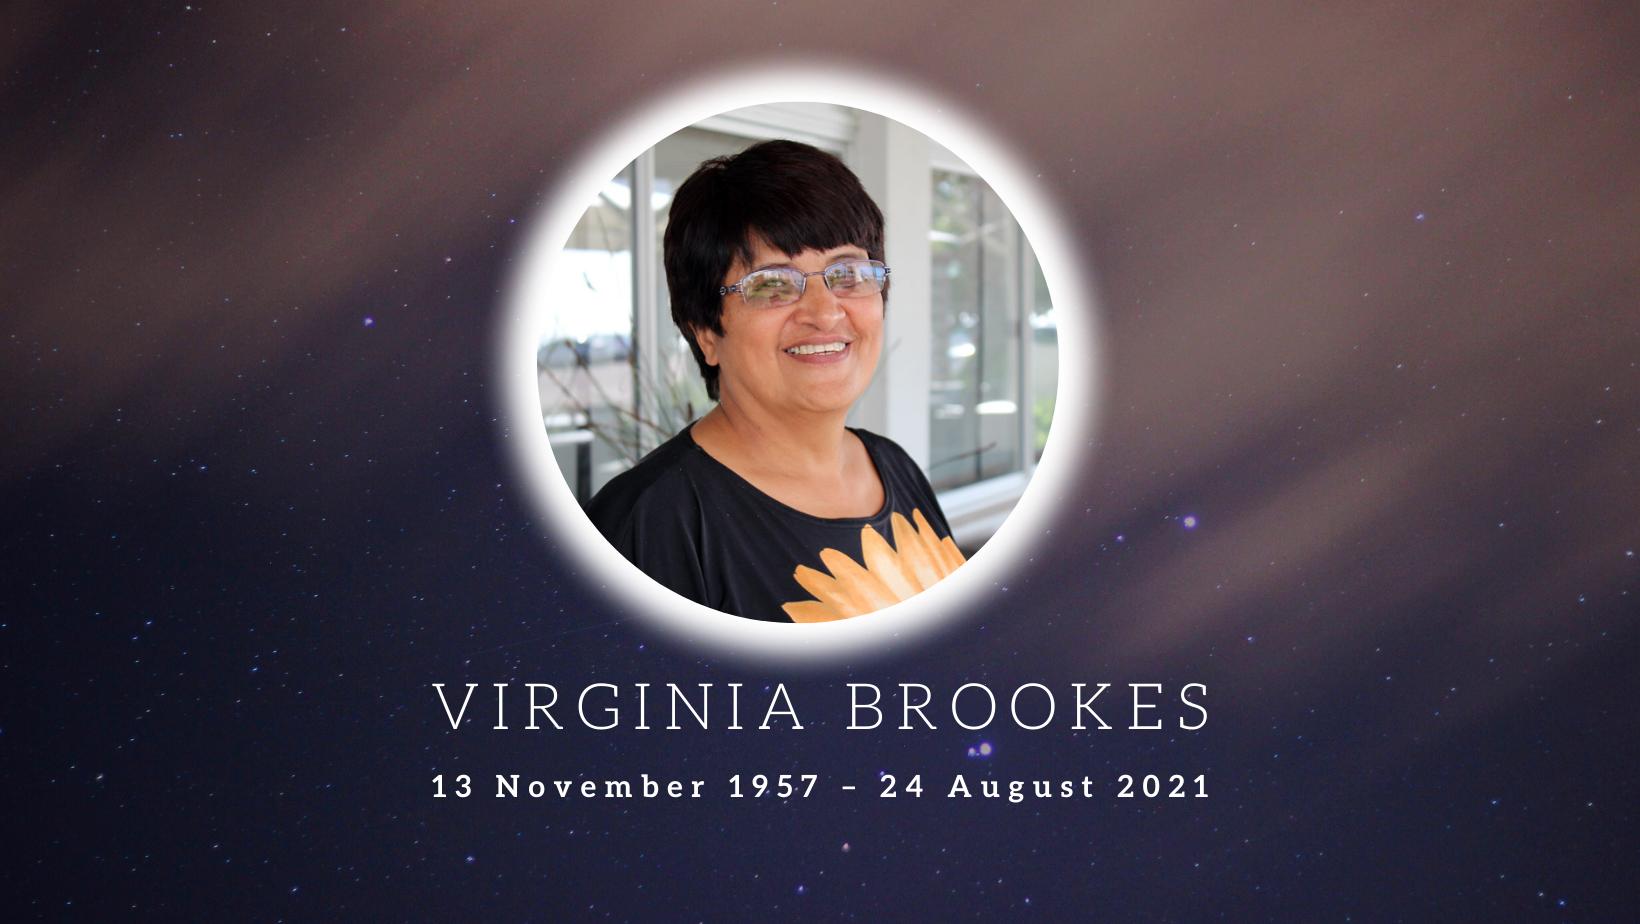 SALO tribute to Virginia Brookes: